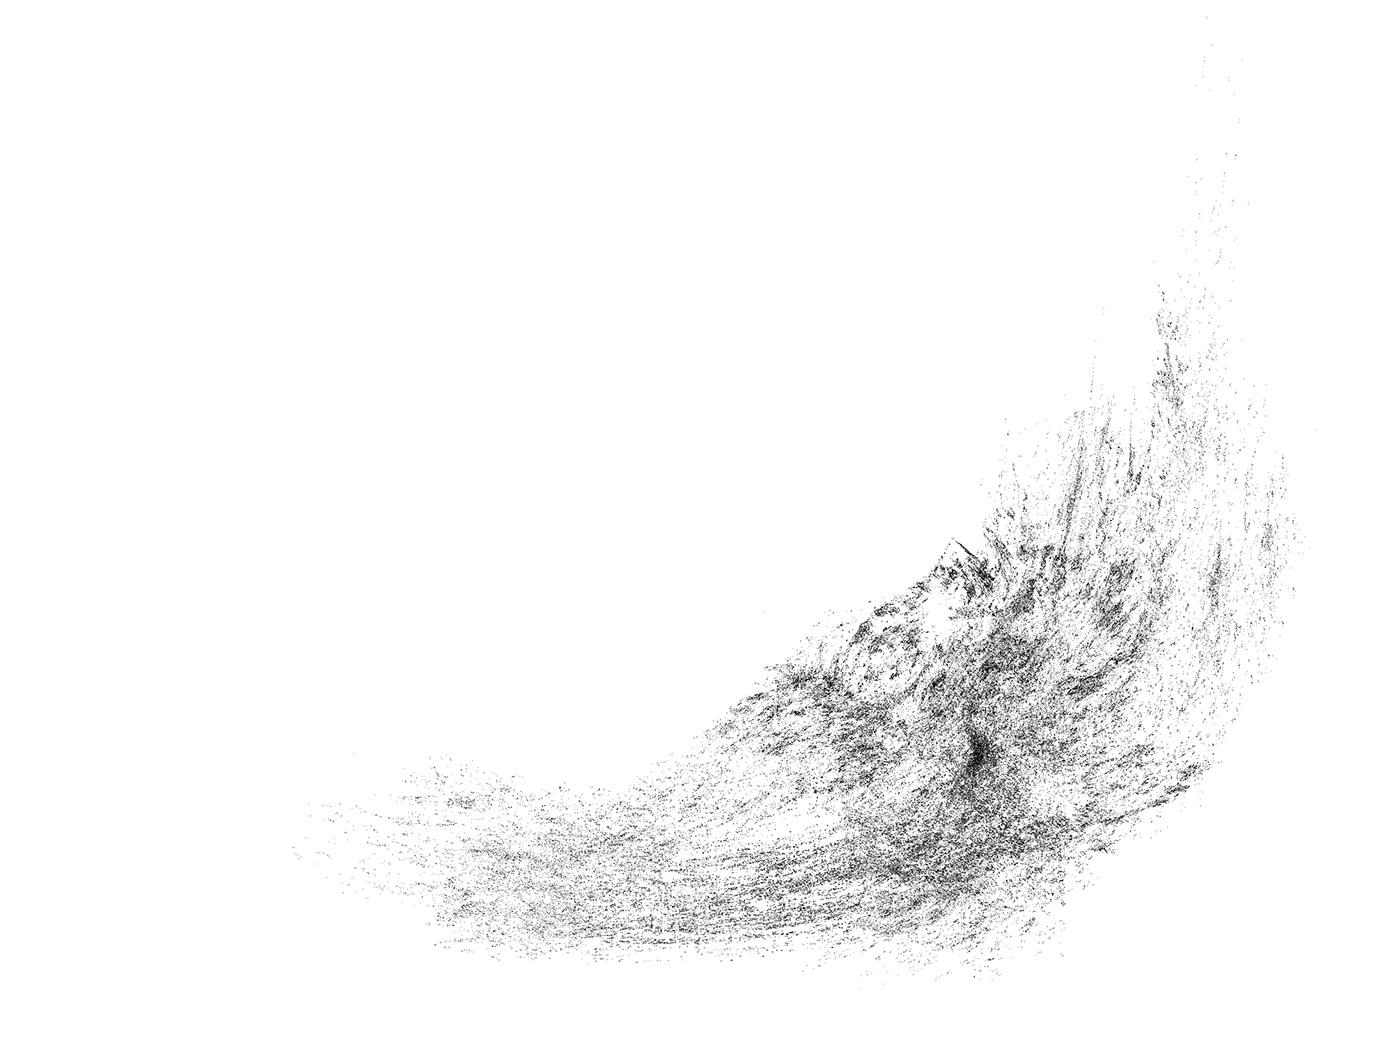 Digital Drawing Drawing  Landscape ms paint Pixel art